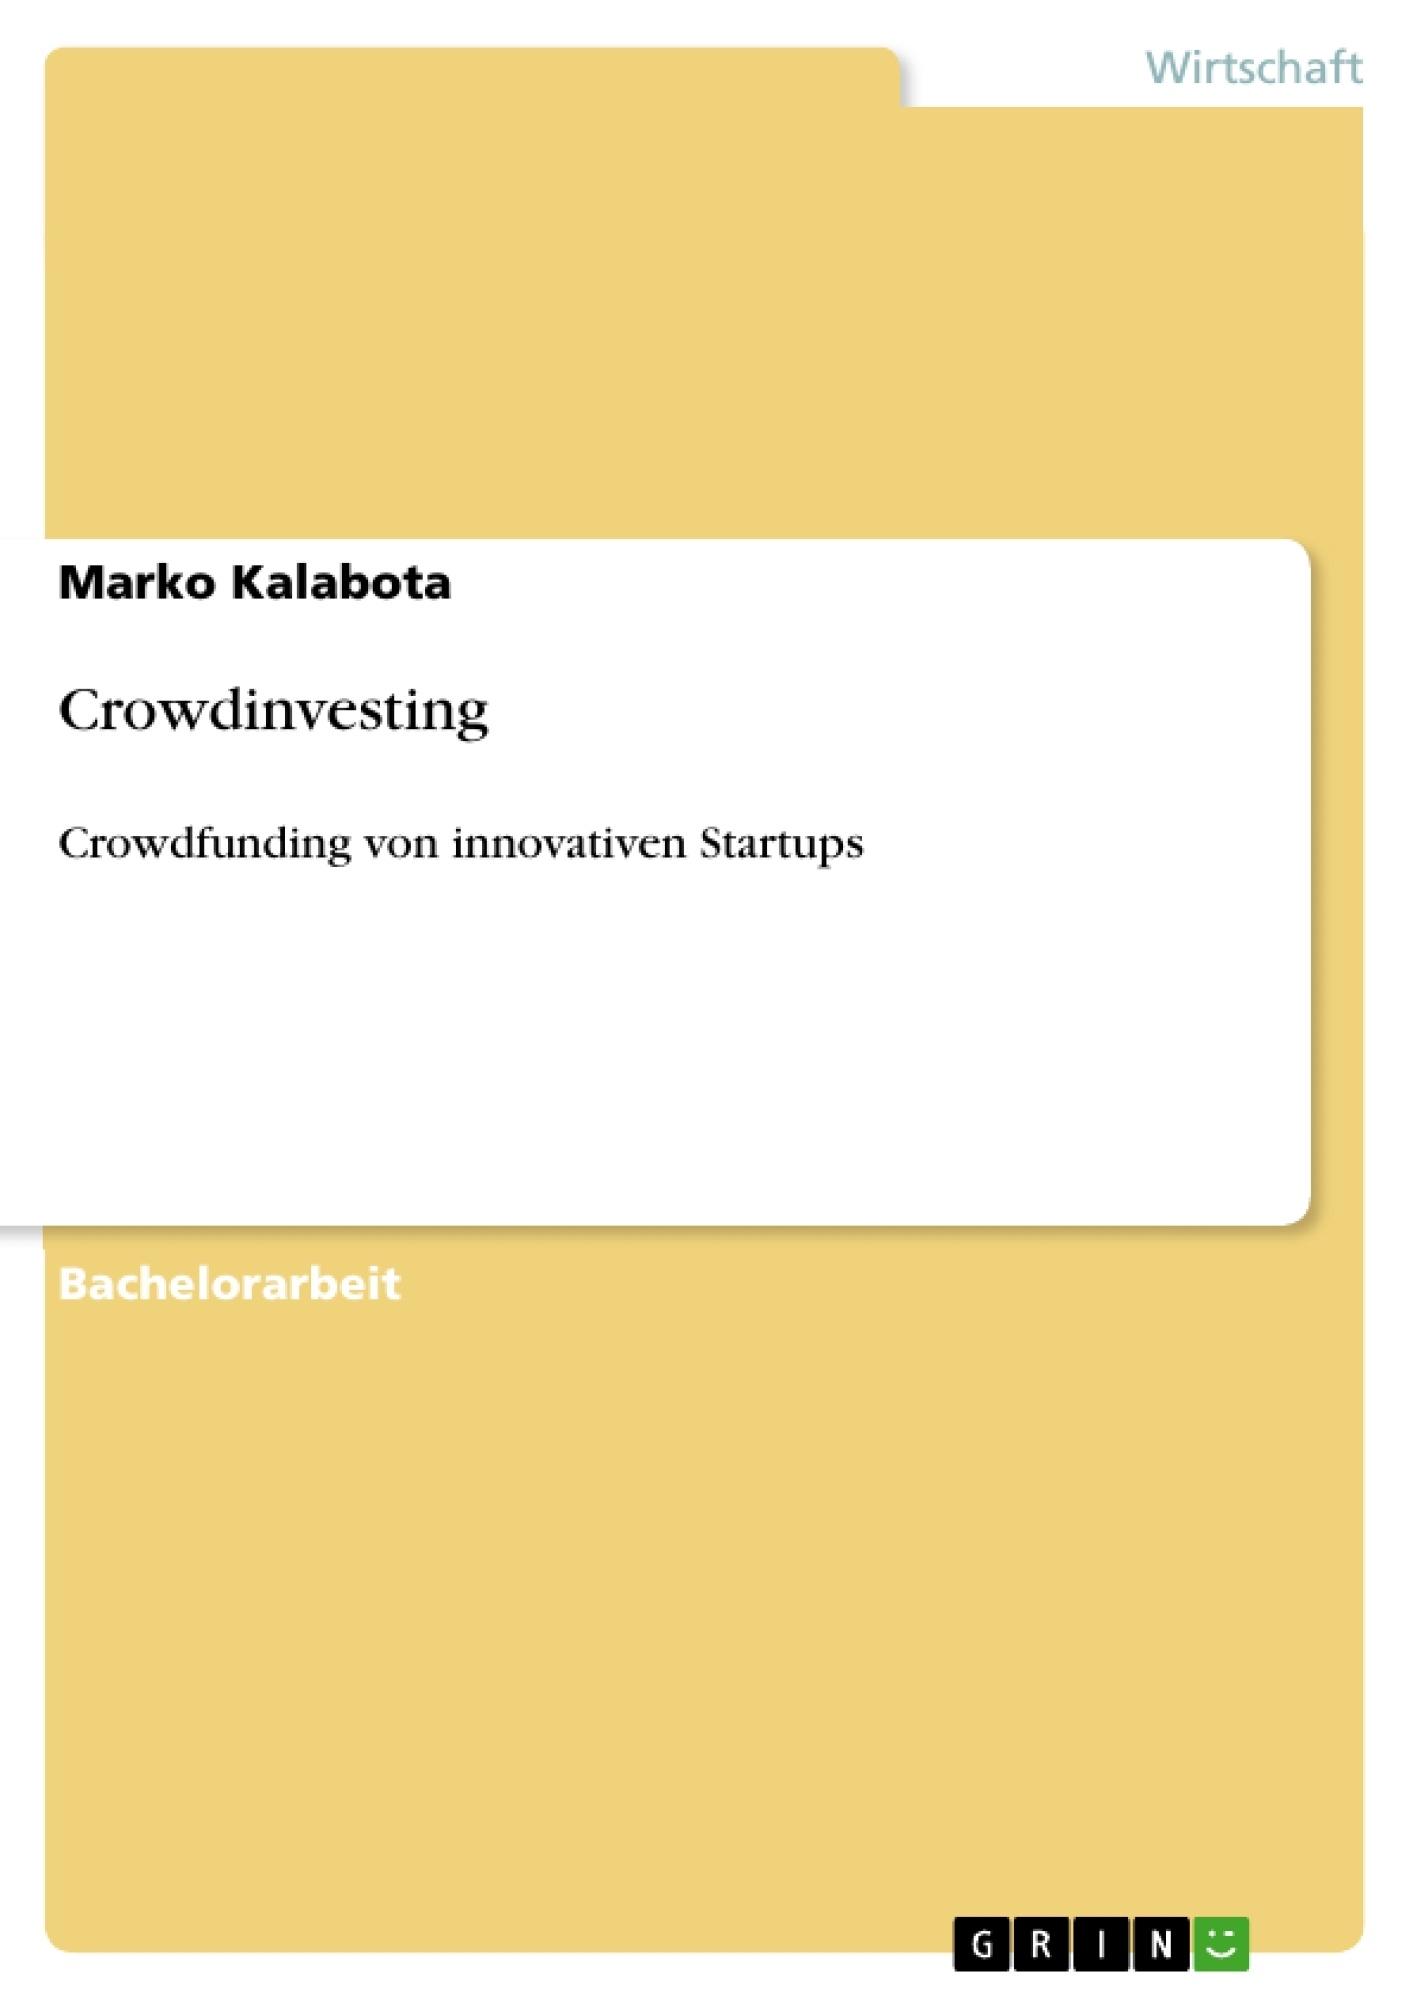 Titel: Crowdinvesting